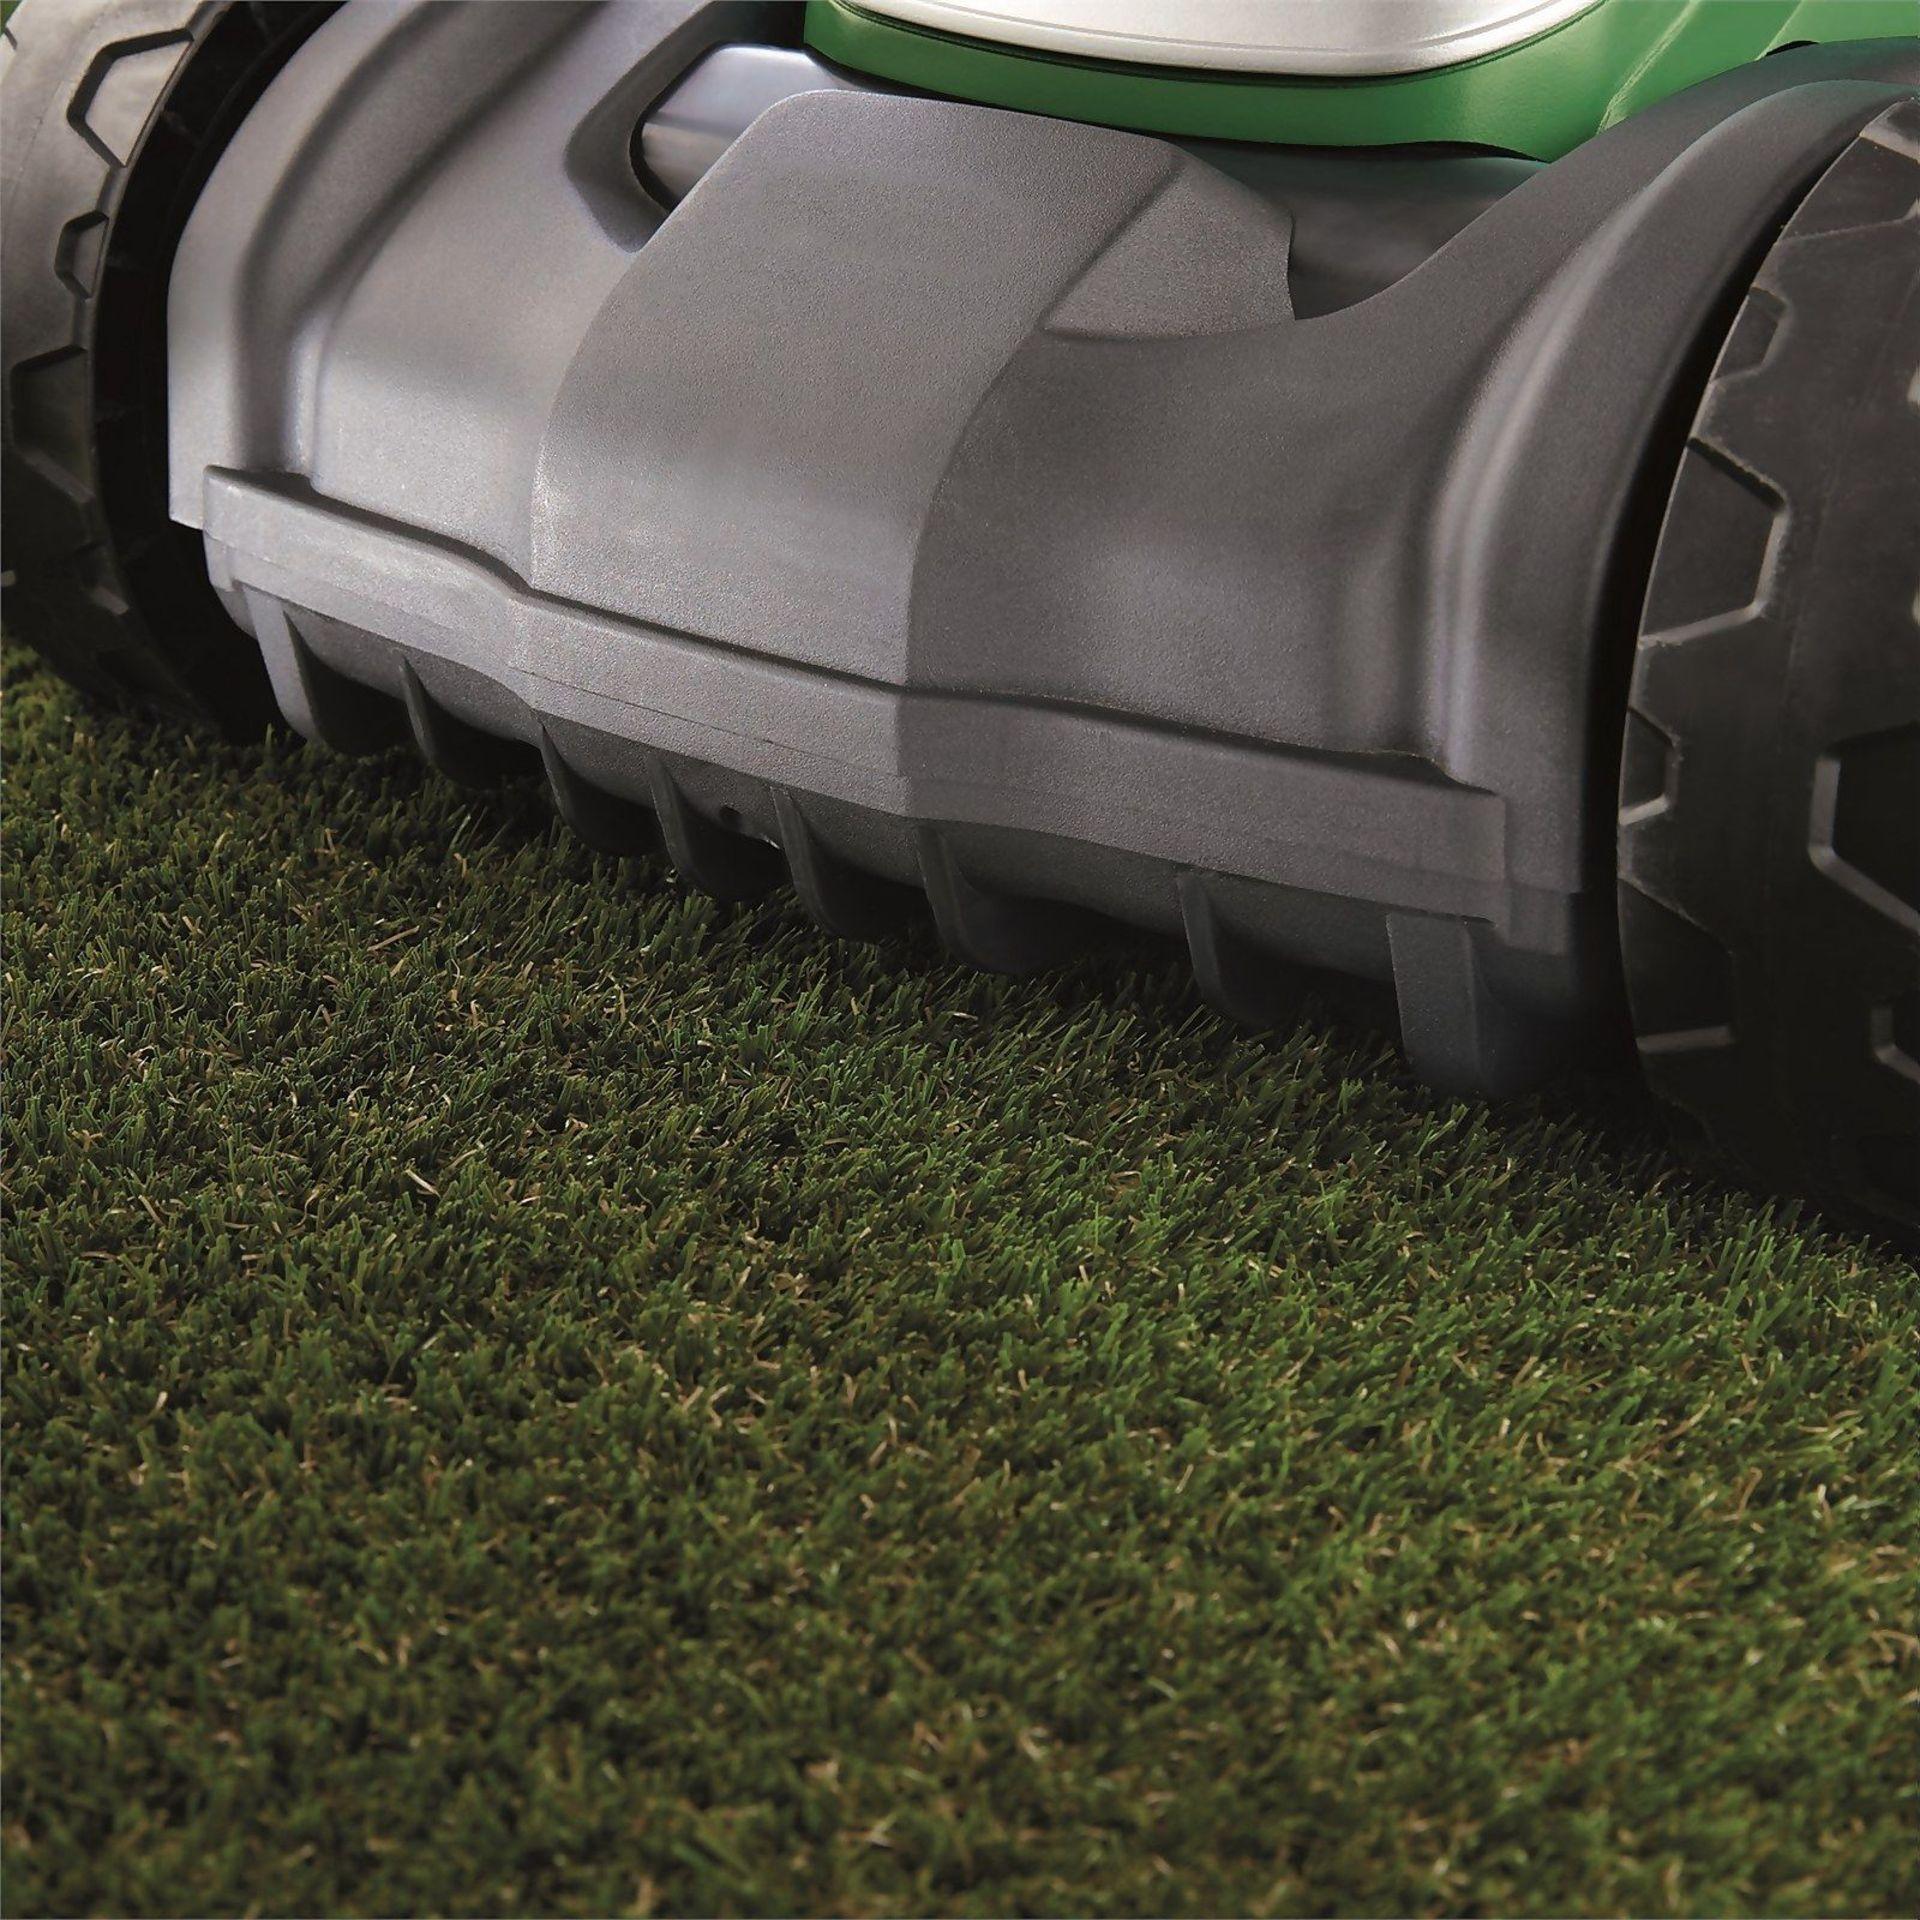 (P7) 1x Powerbase 37cm 40V Cordless Lawn Mower RRP £229. New, Sealed Unit. - Image 2 of 4